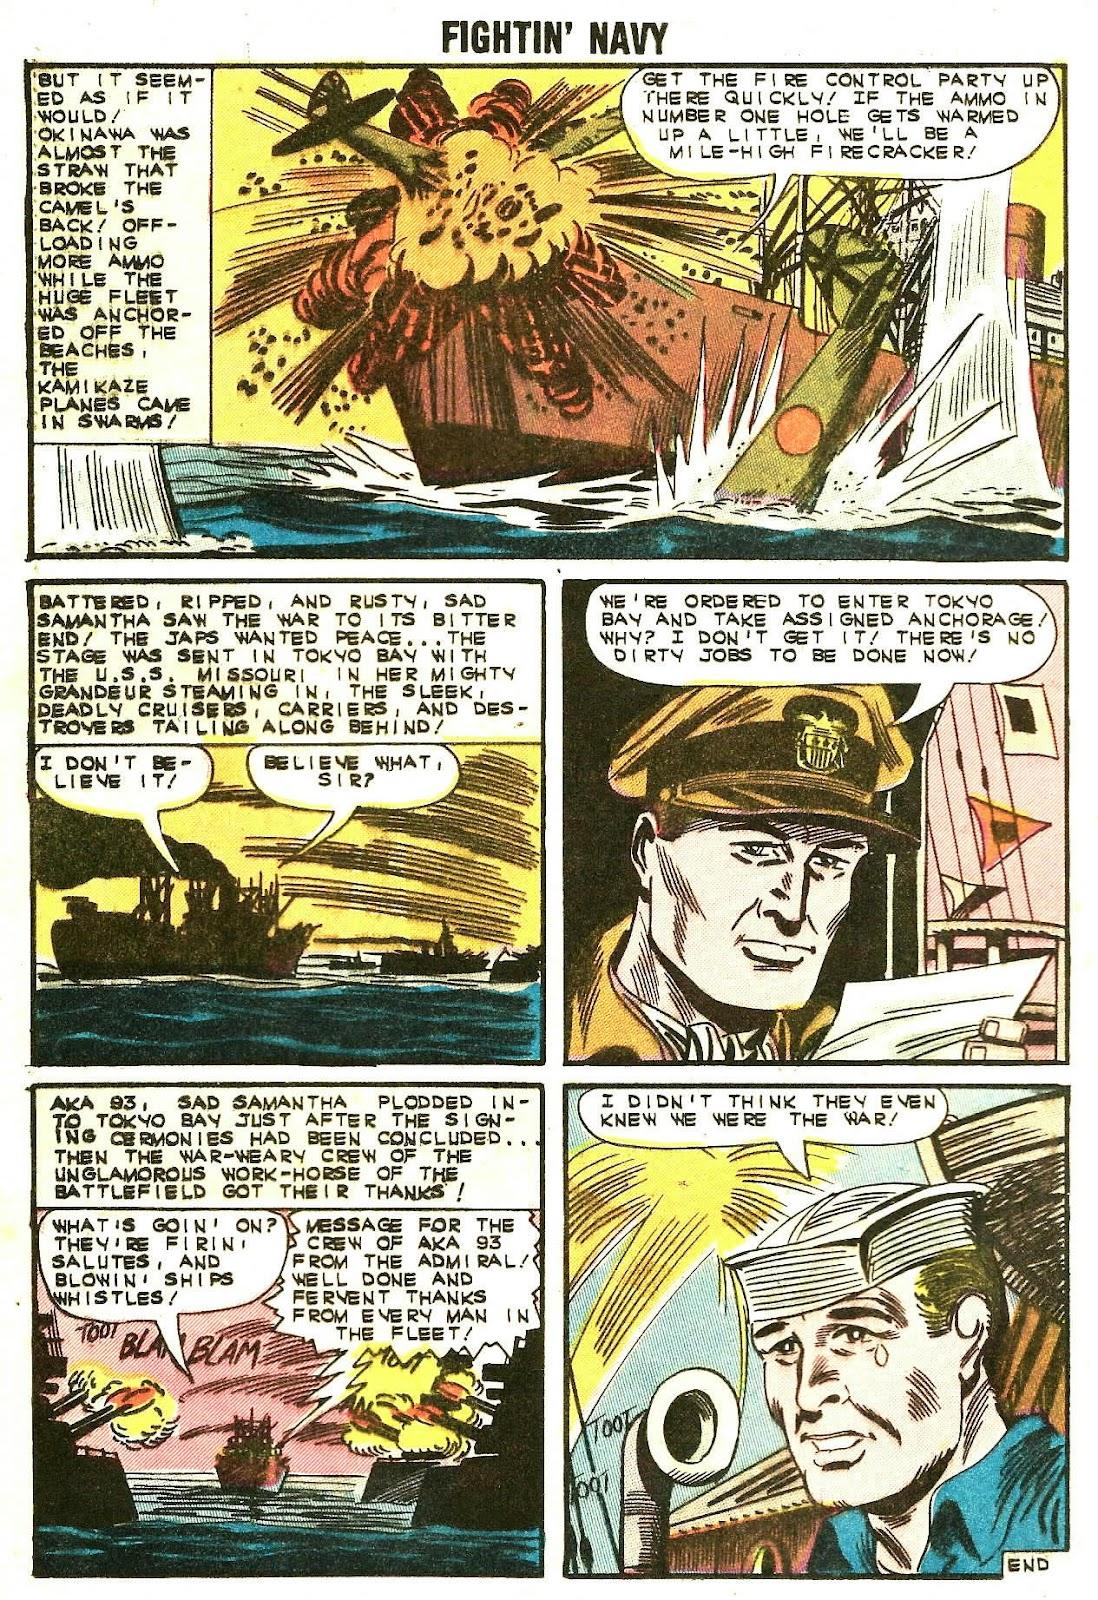 Read online Fightin' Navy comic -  Issue #107 - 24